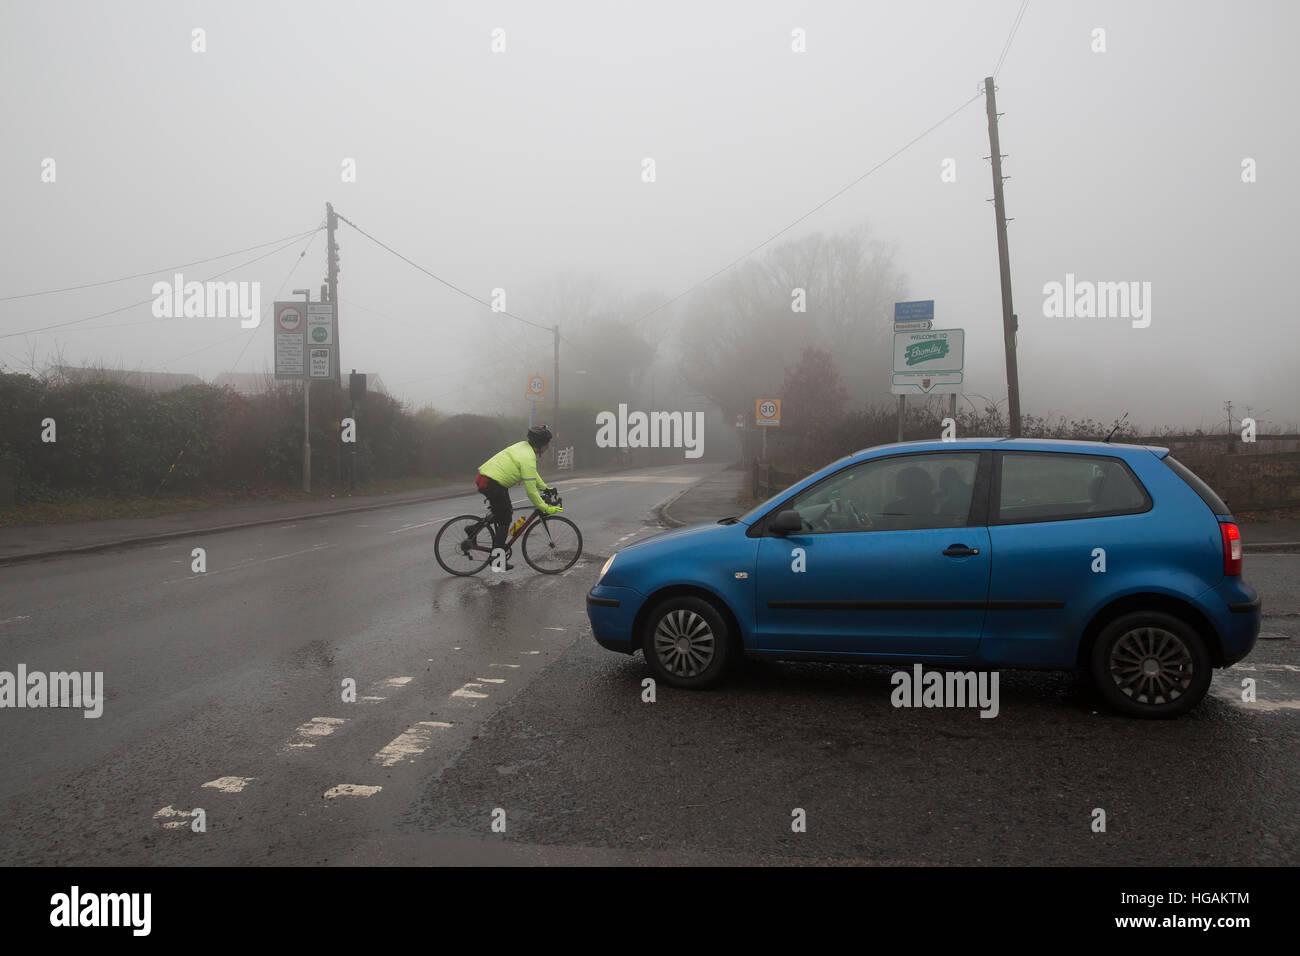 Westerham, UK. 7th Jan, 2017. Fog in Westerham, Kent © Keith Larby/Alamy Live News - Stock Image